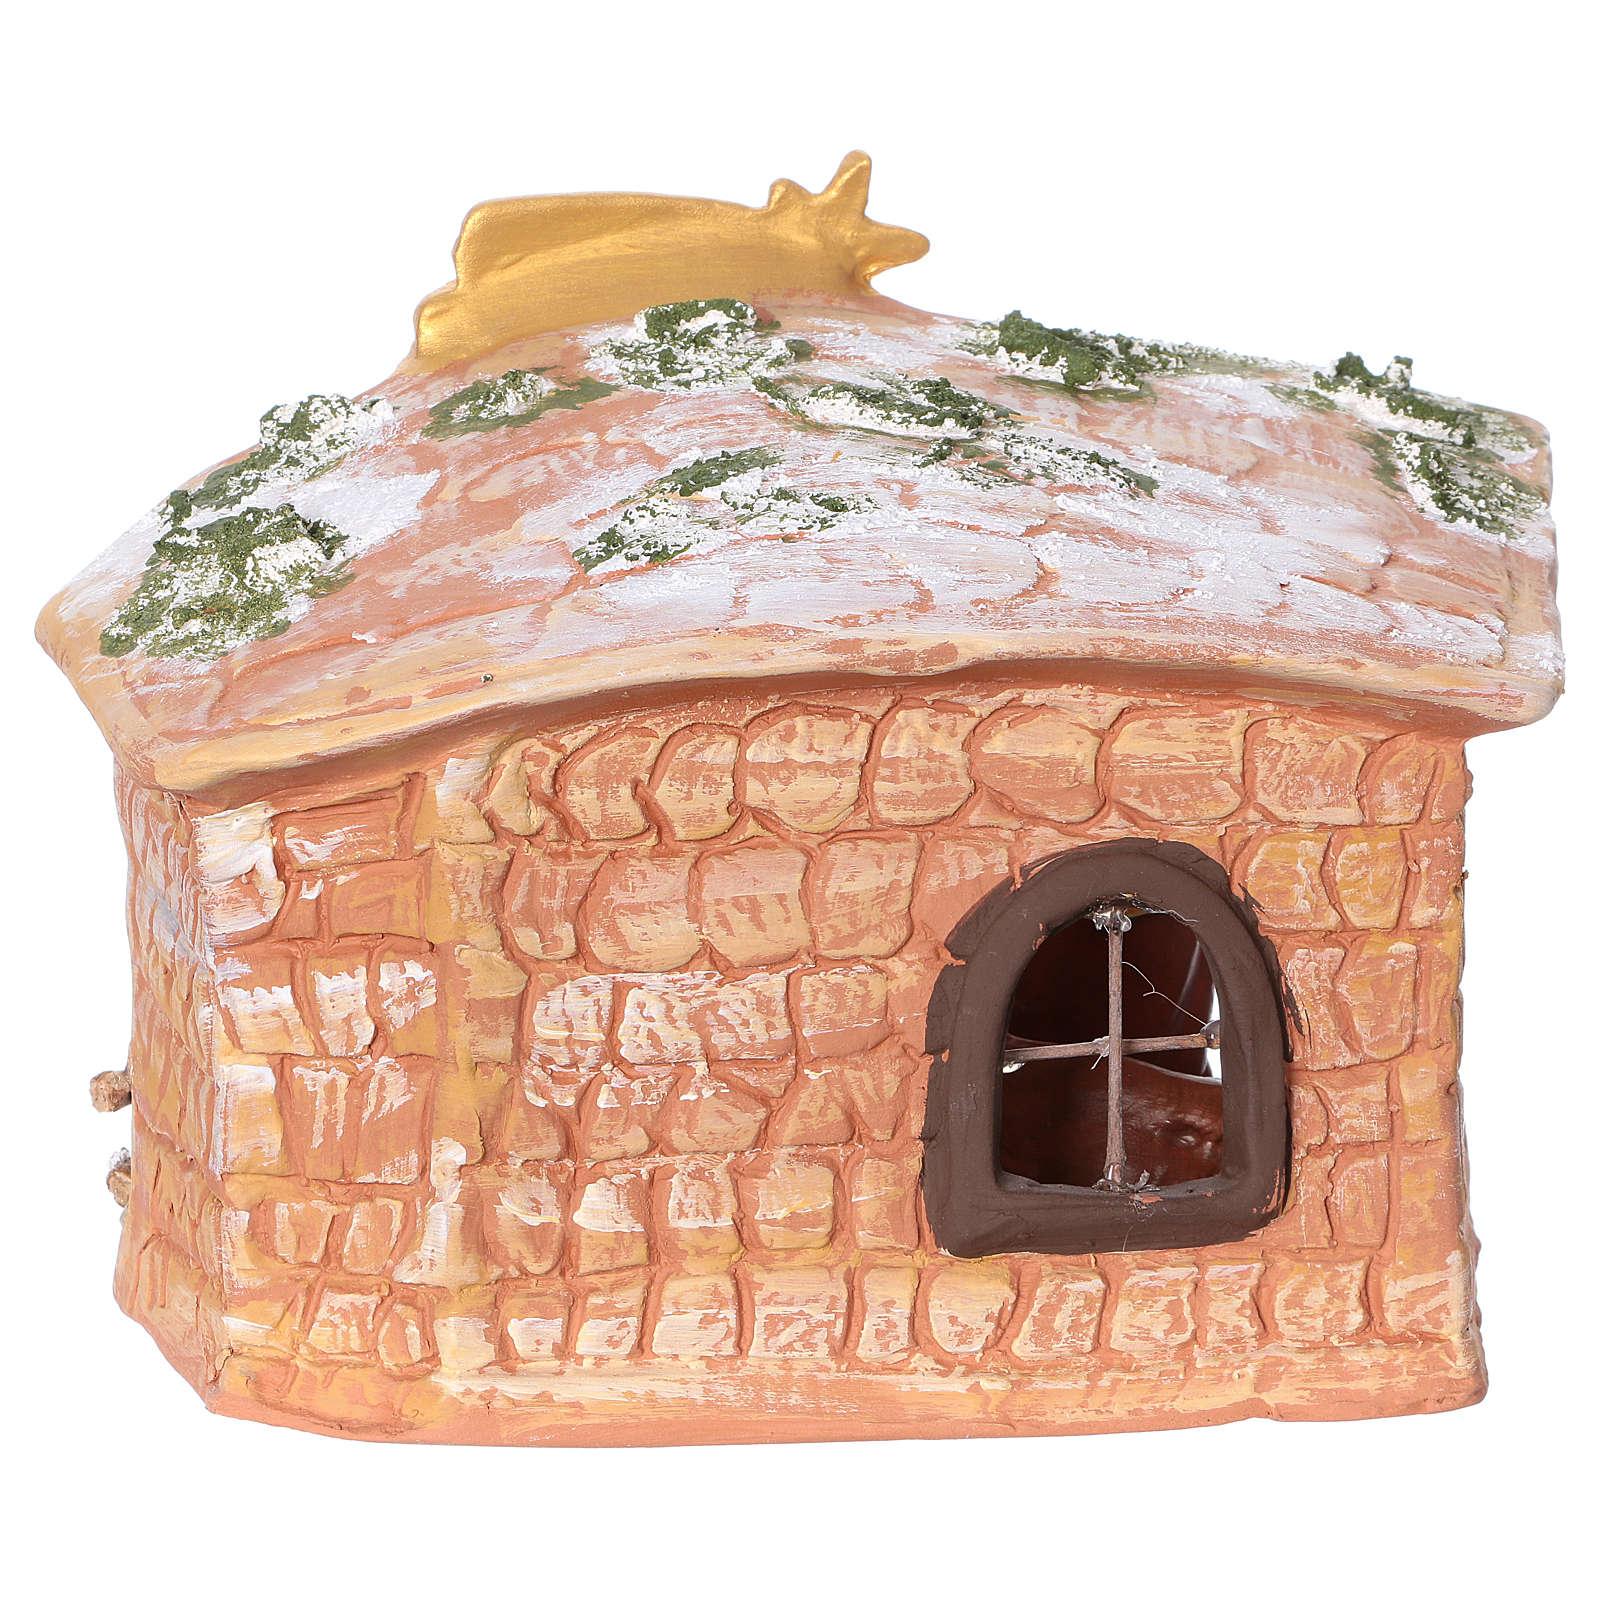 Capanna in terracotta dipinta con natività 8 cm 20x20x15 cm 4